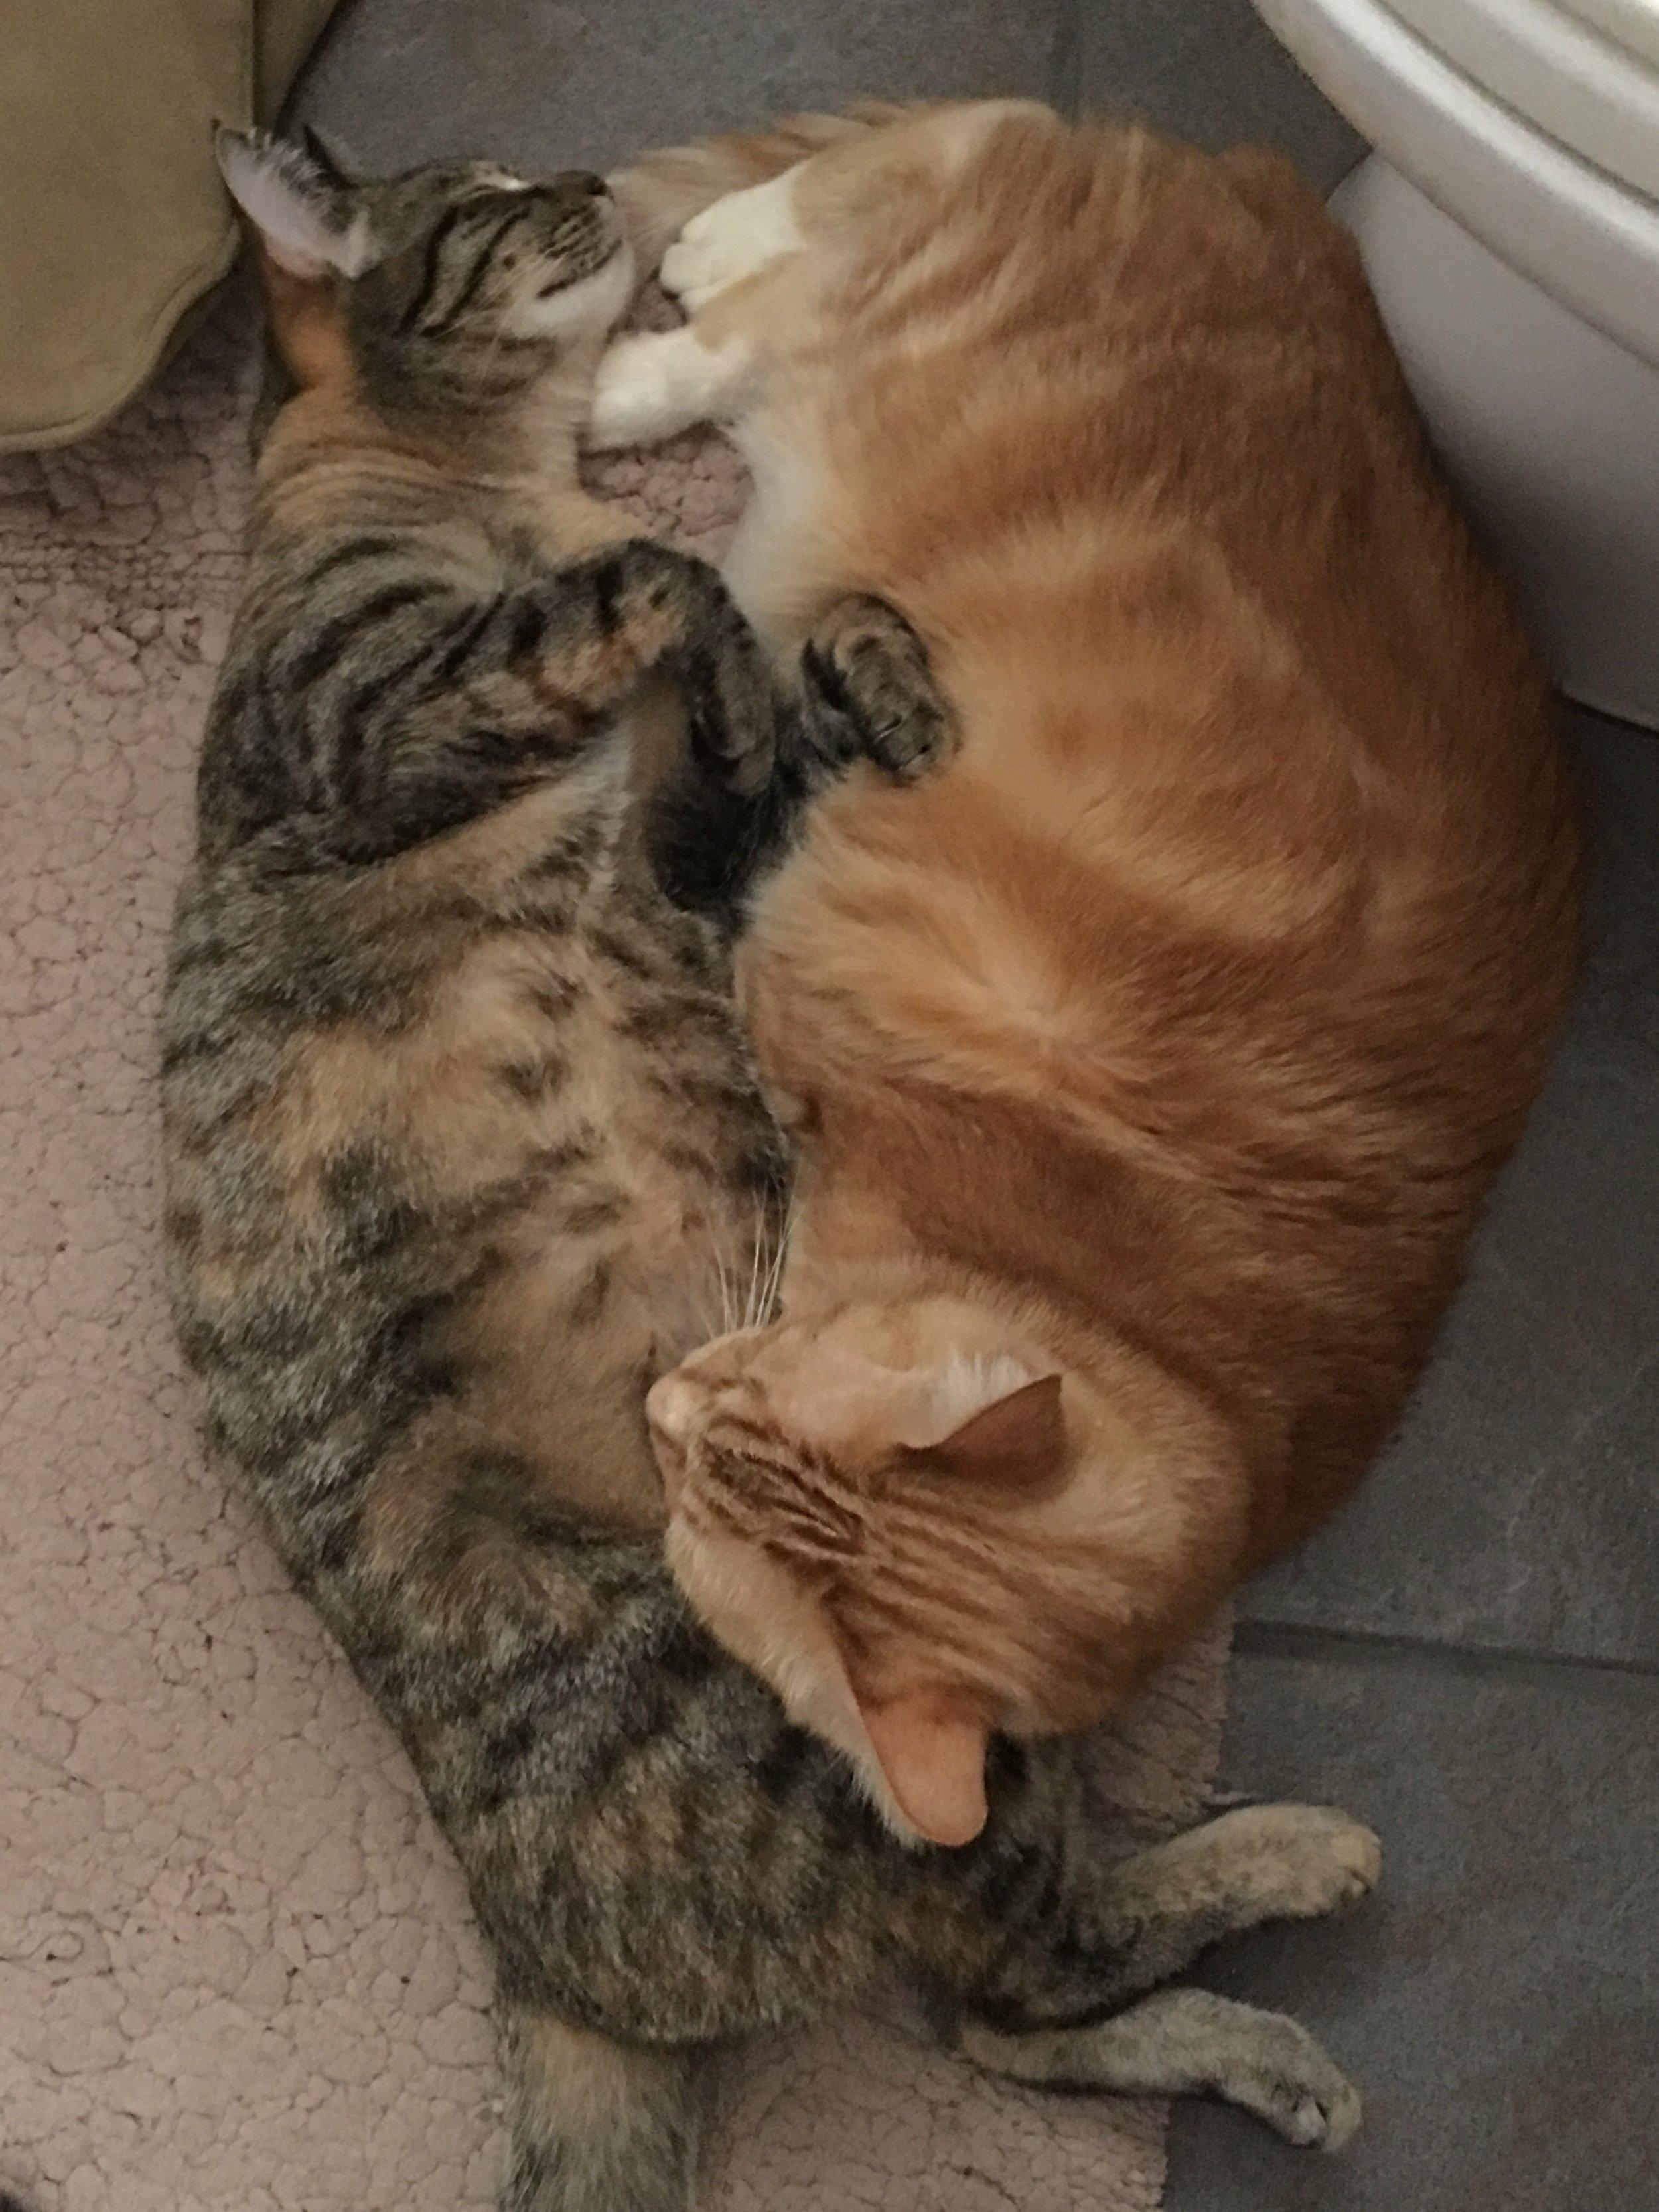 Joy (FKA Oak), adopted September 2017, and Kena (FKA Peaches), adopted December 2012